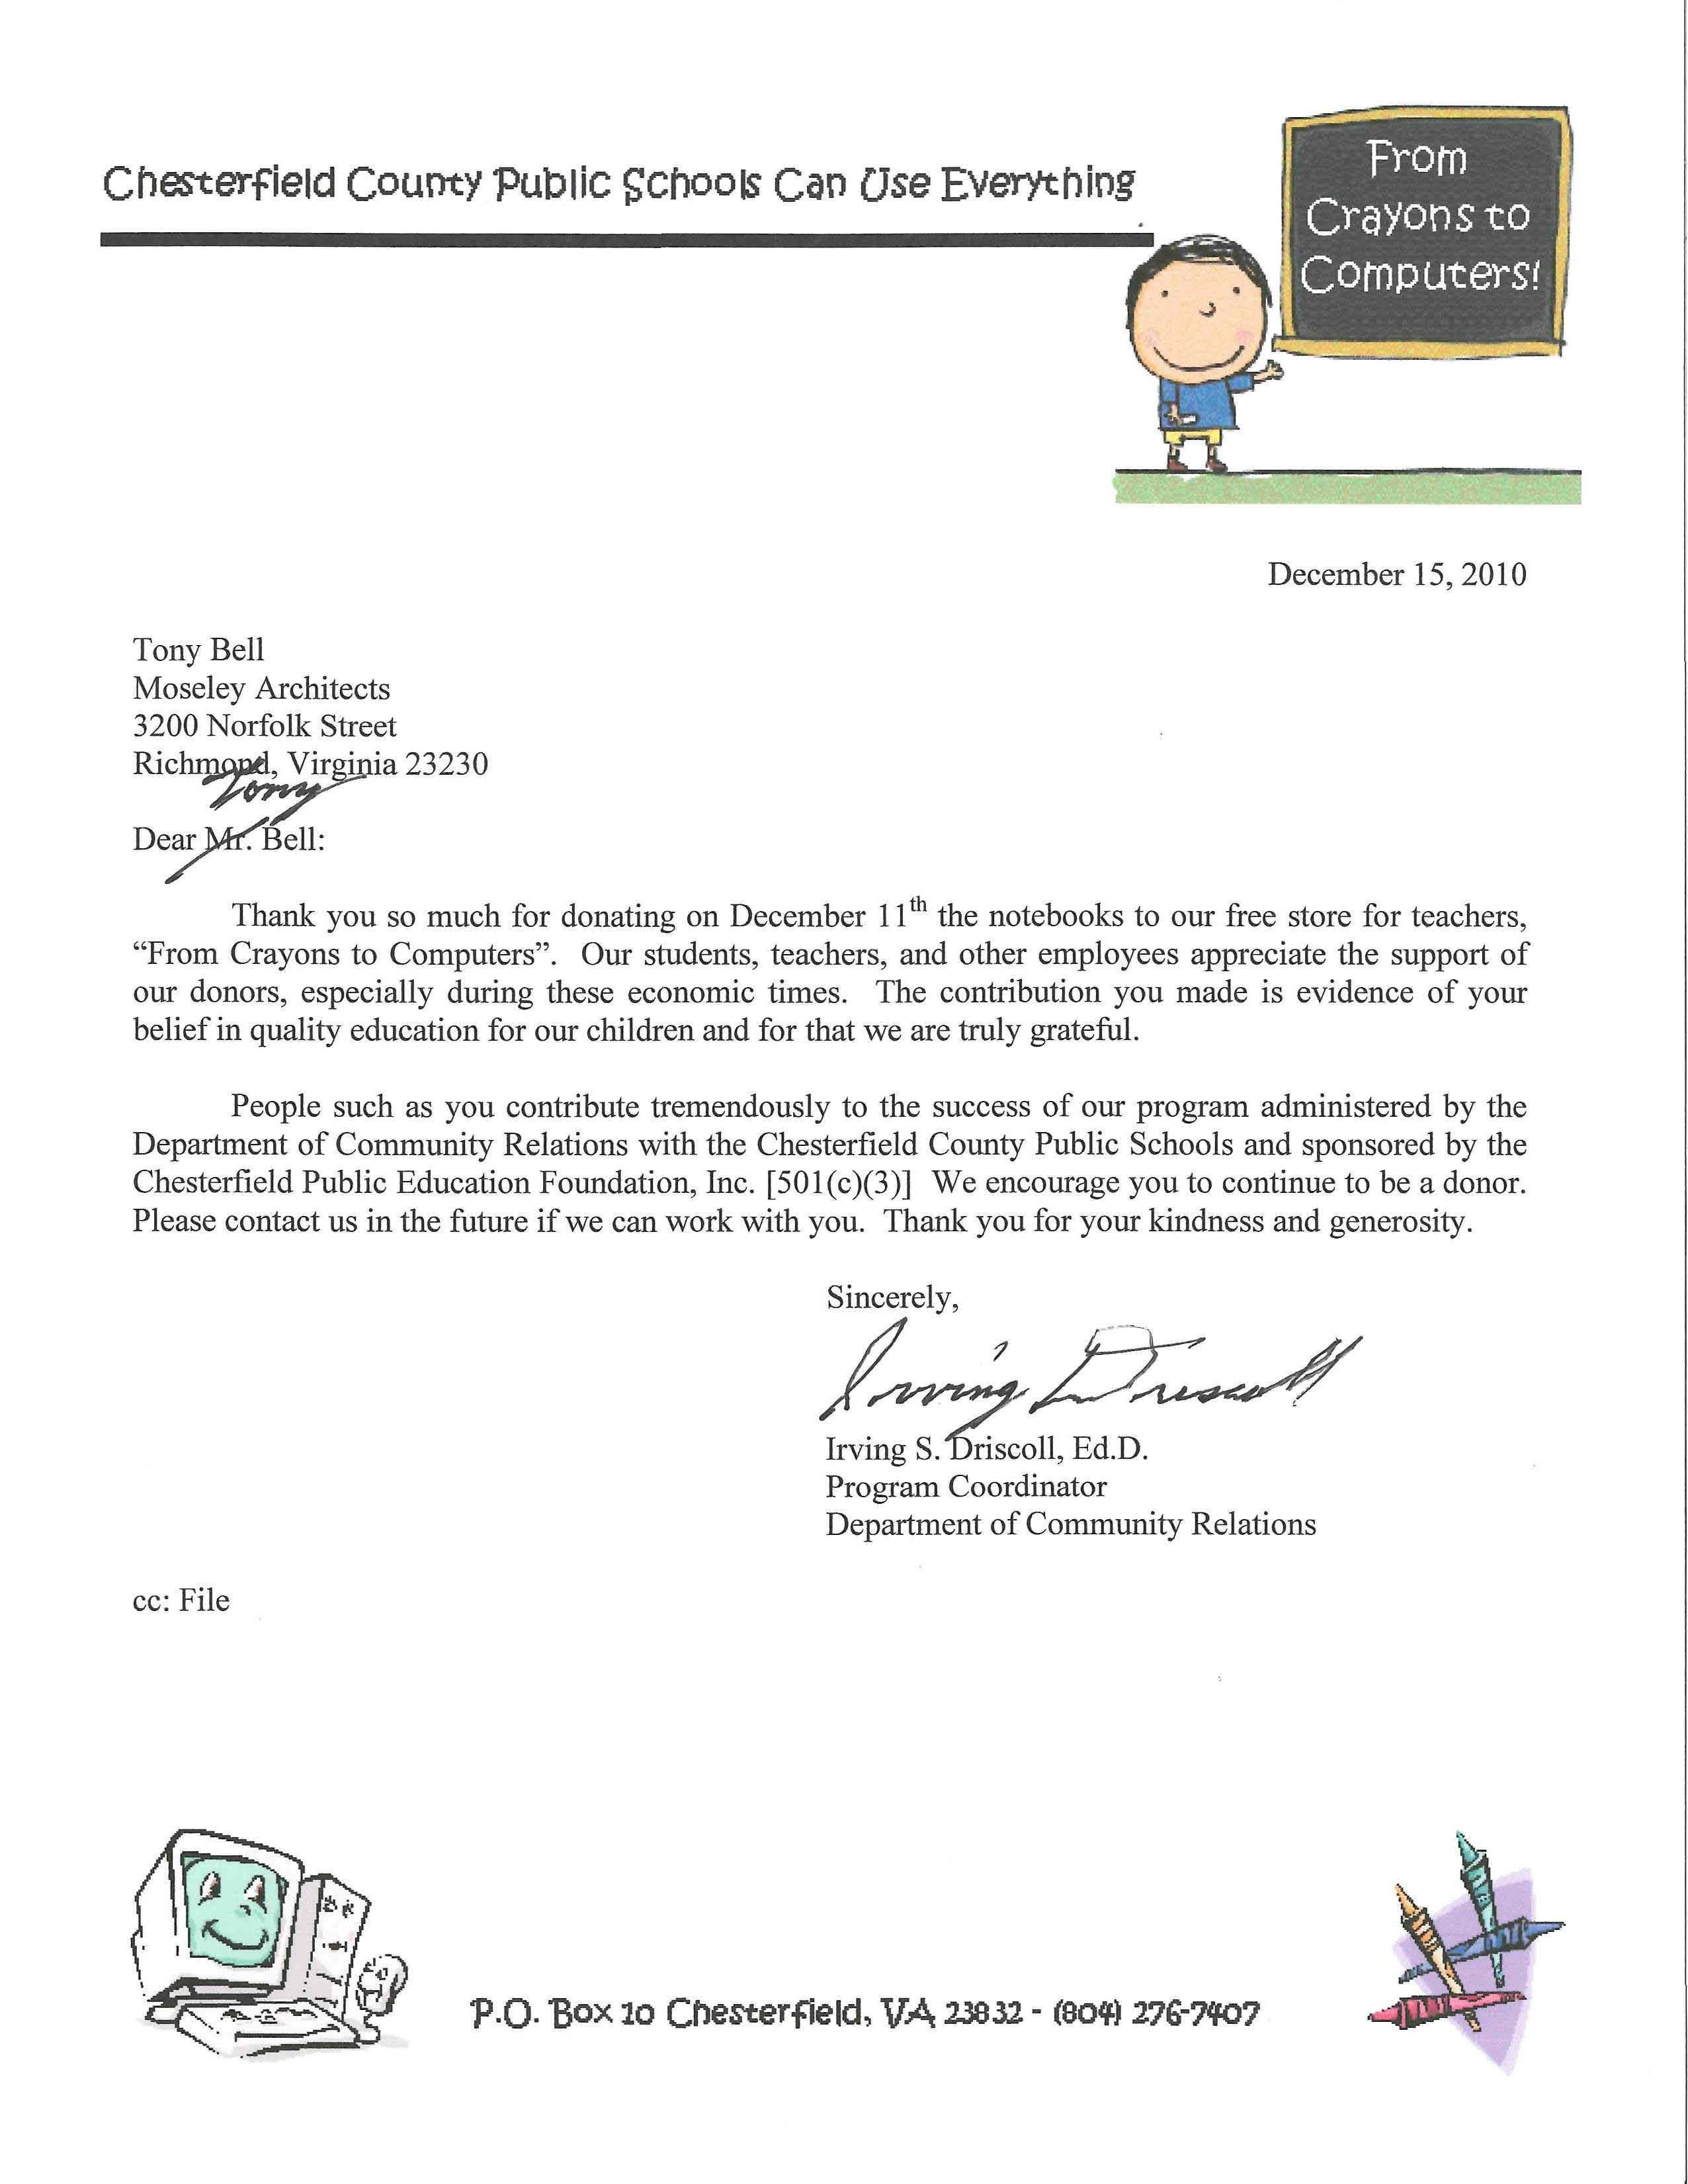 Thank you letter for money donation to school 28 images 8 thank you letter for money donation to school thank you letter for donation of school supplies altavistaventures Gallery